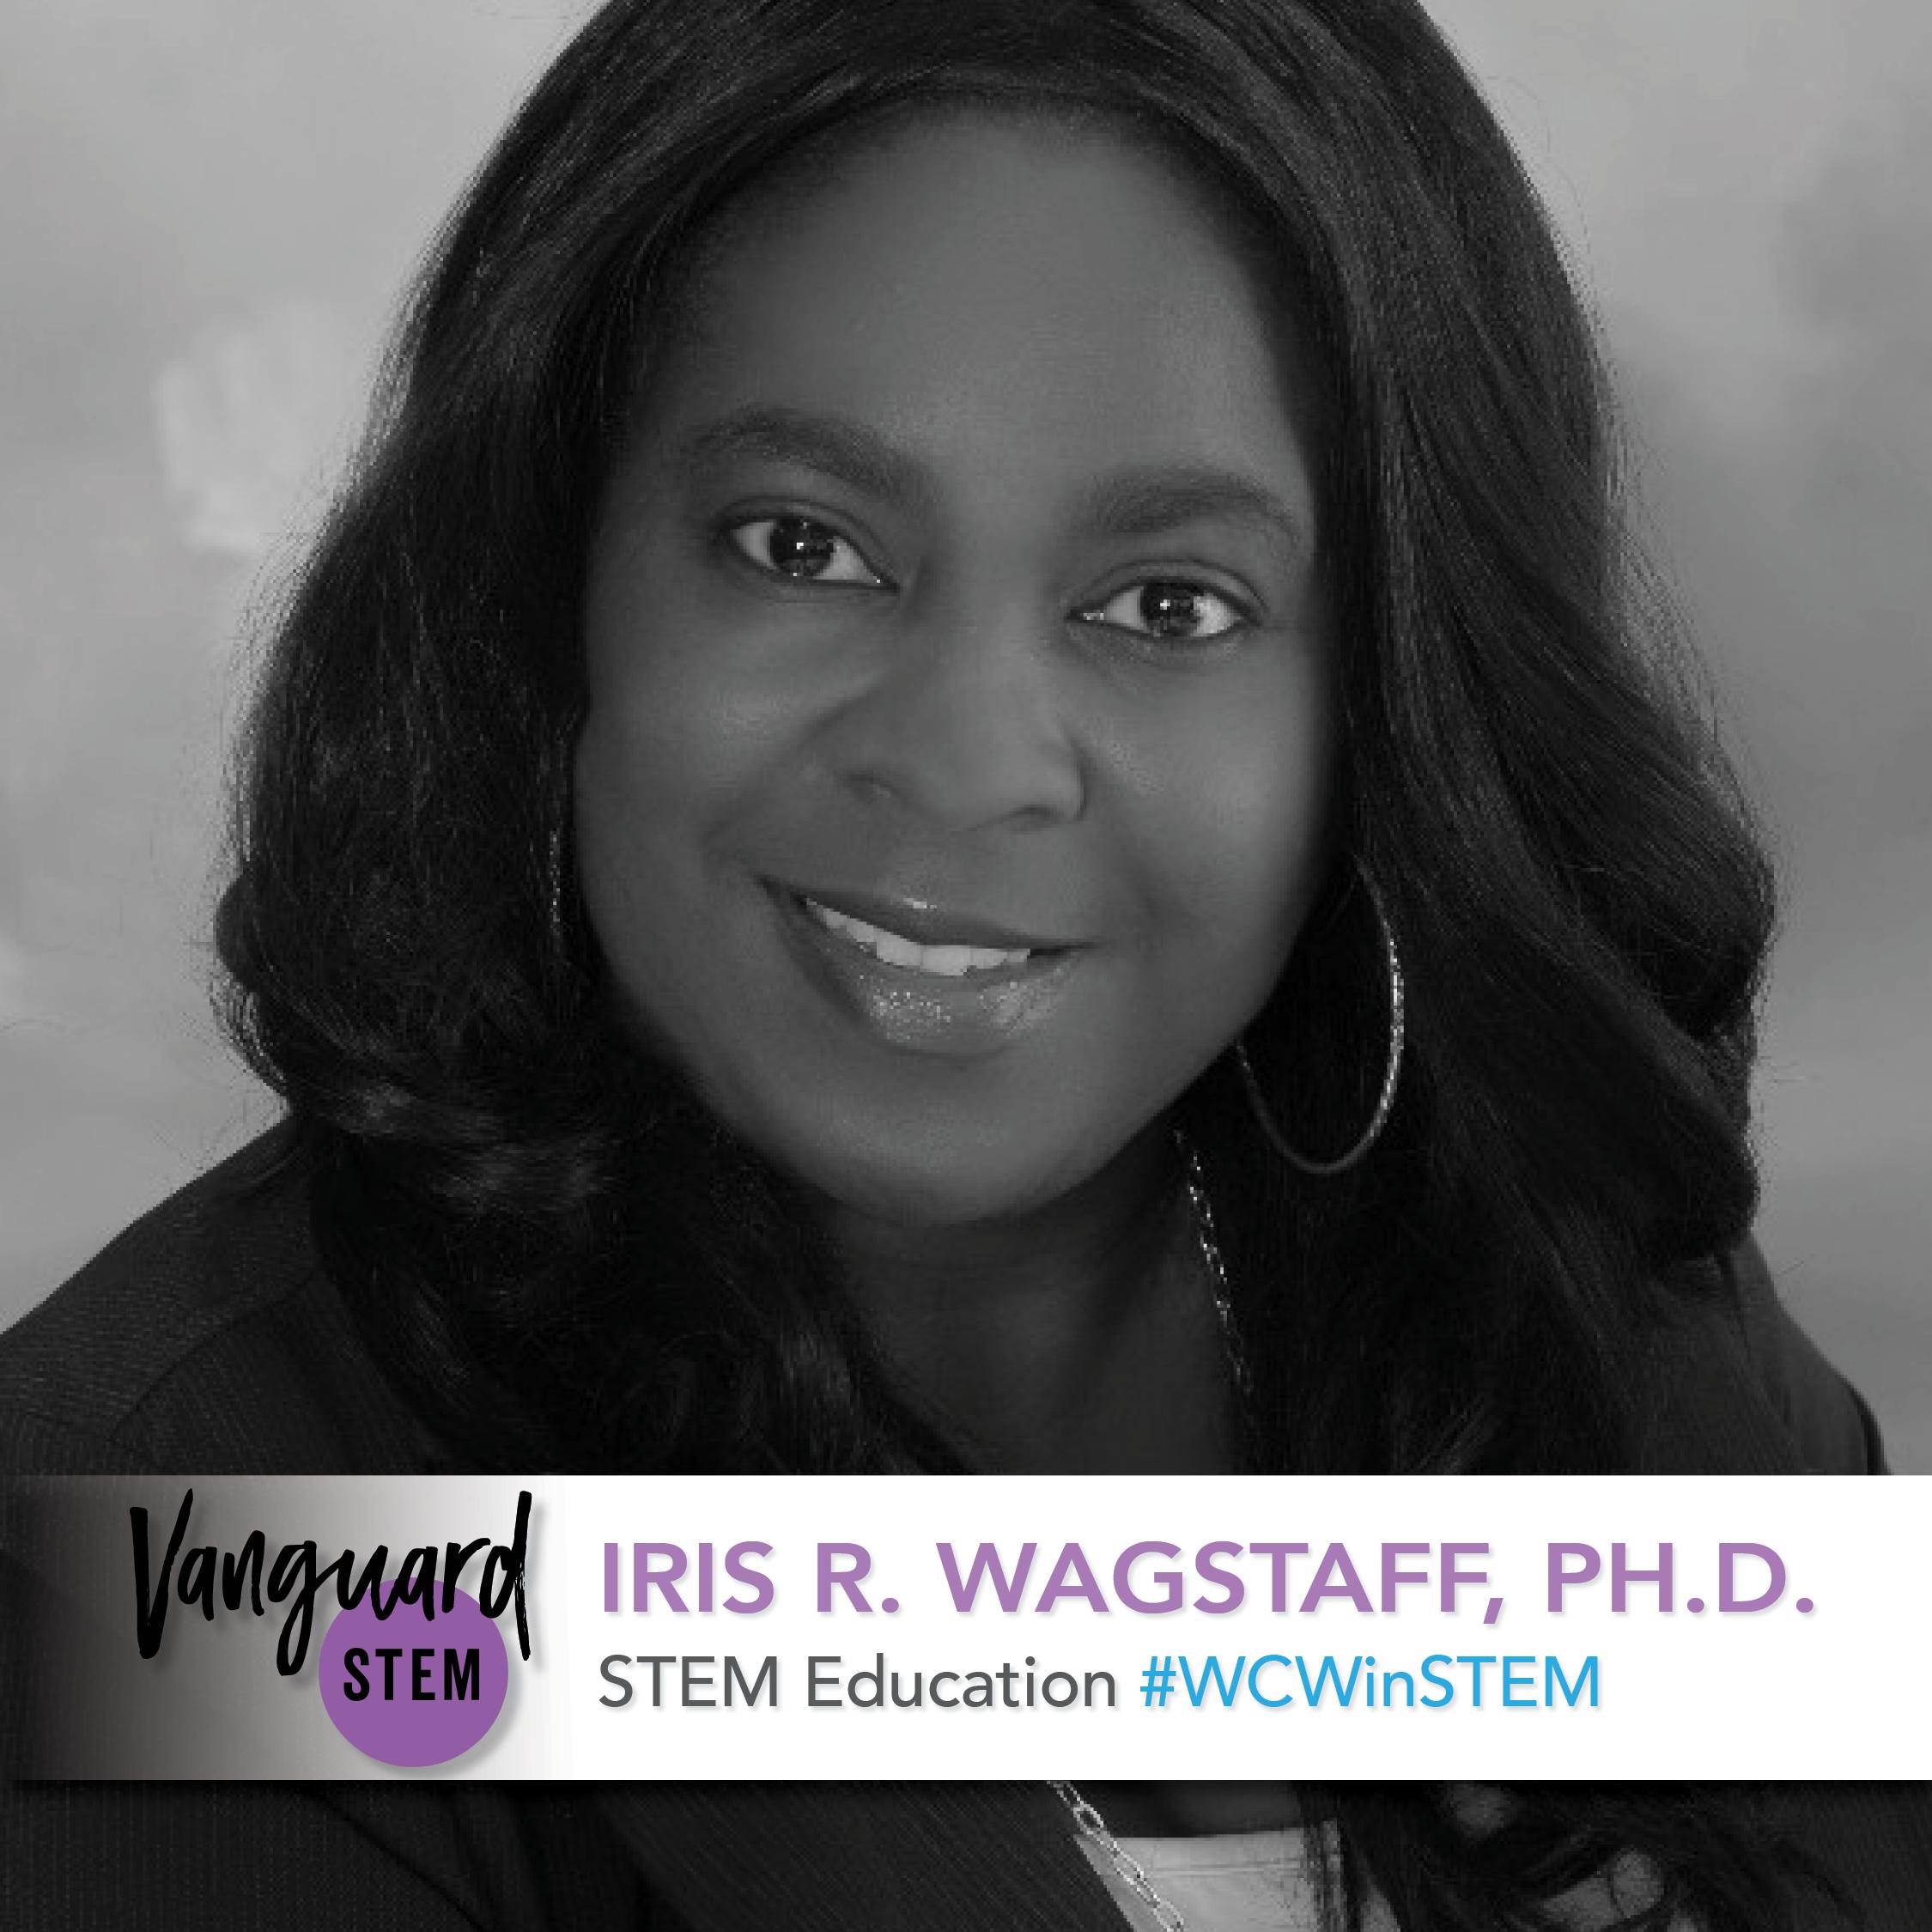 Iris R. Wagstaff, Ph.D.